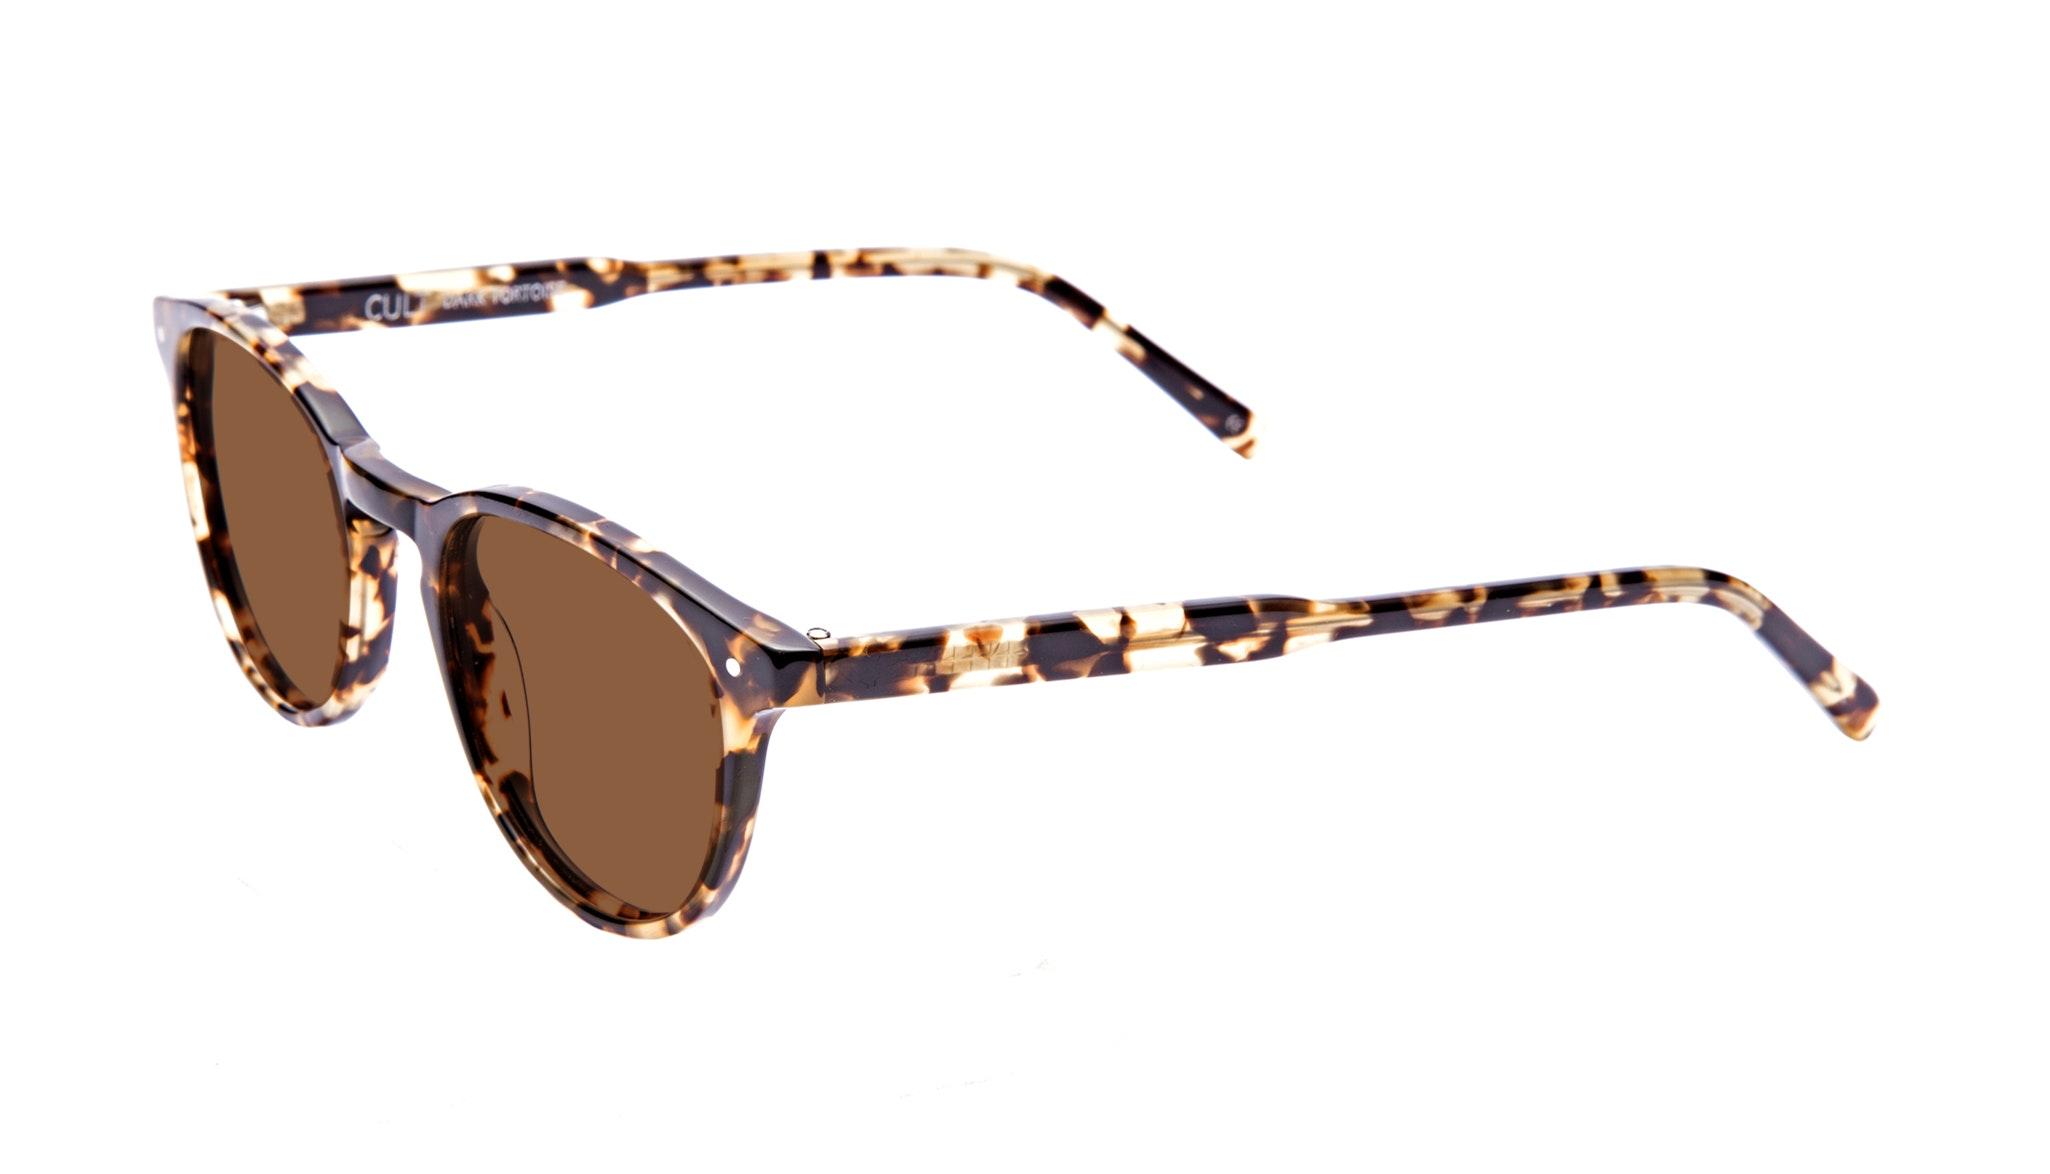 Affordable Fashion Glasses Round Sunglasses Men Cult Dark Tortoise Tilt